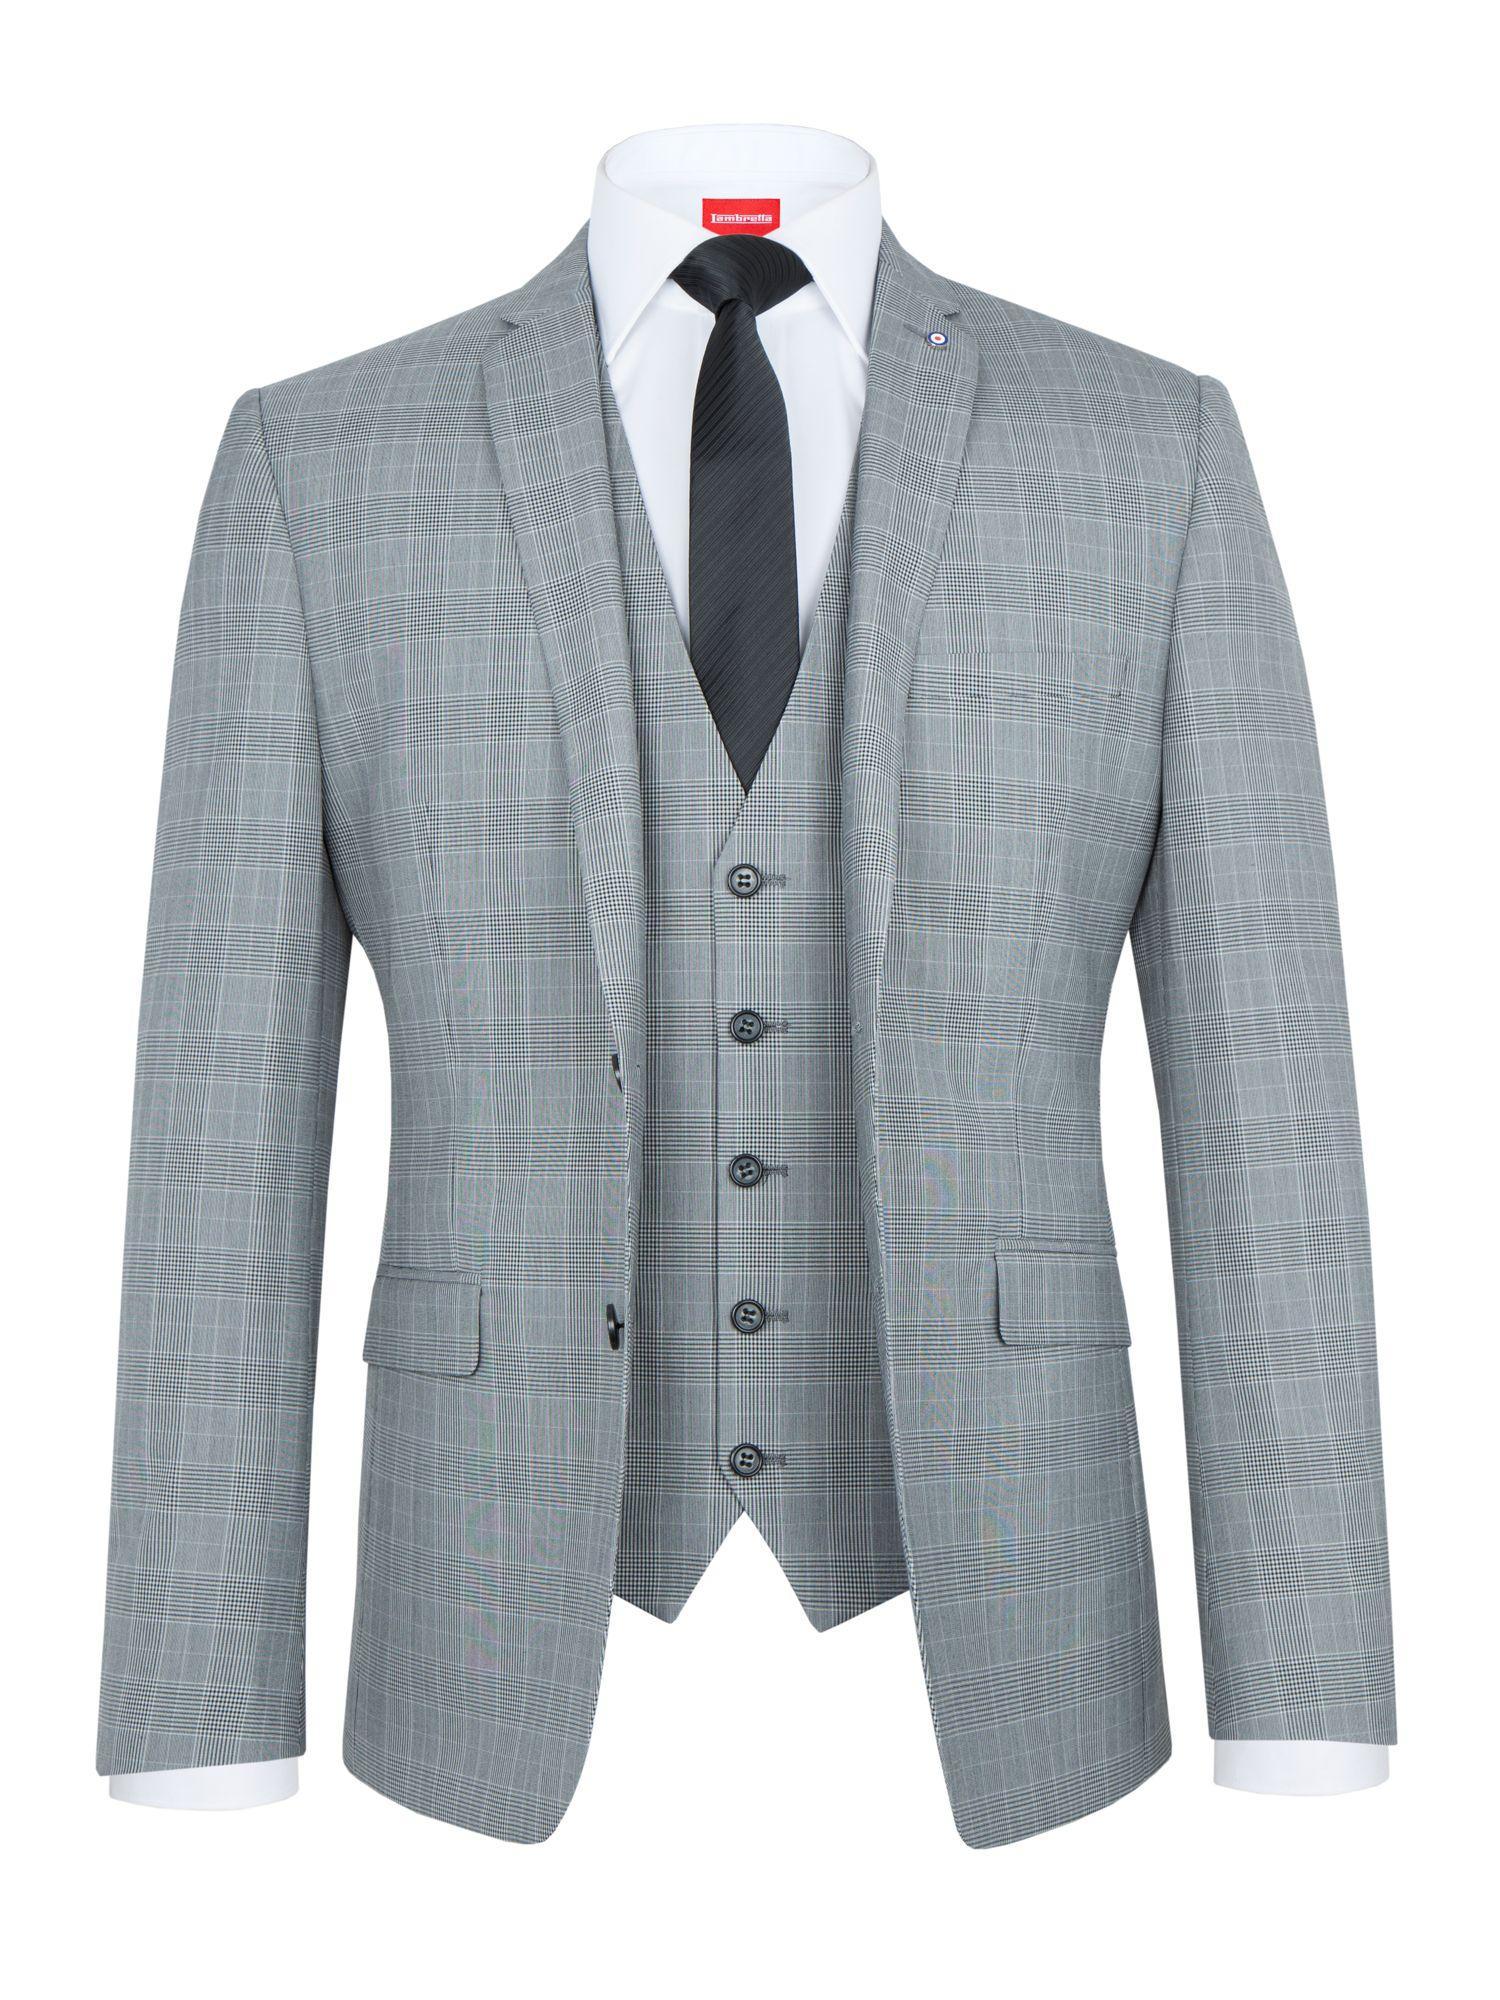 Brown Suit Grey Shoes